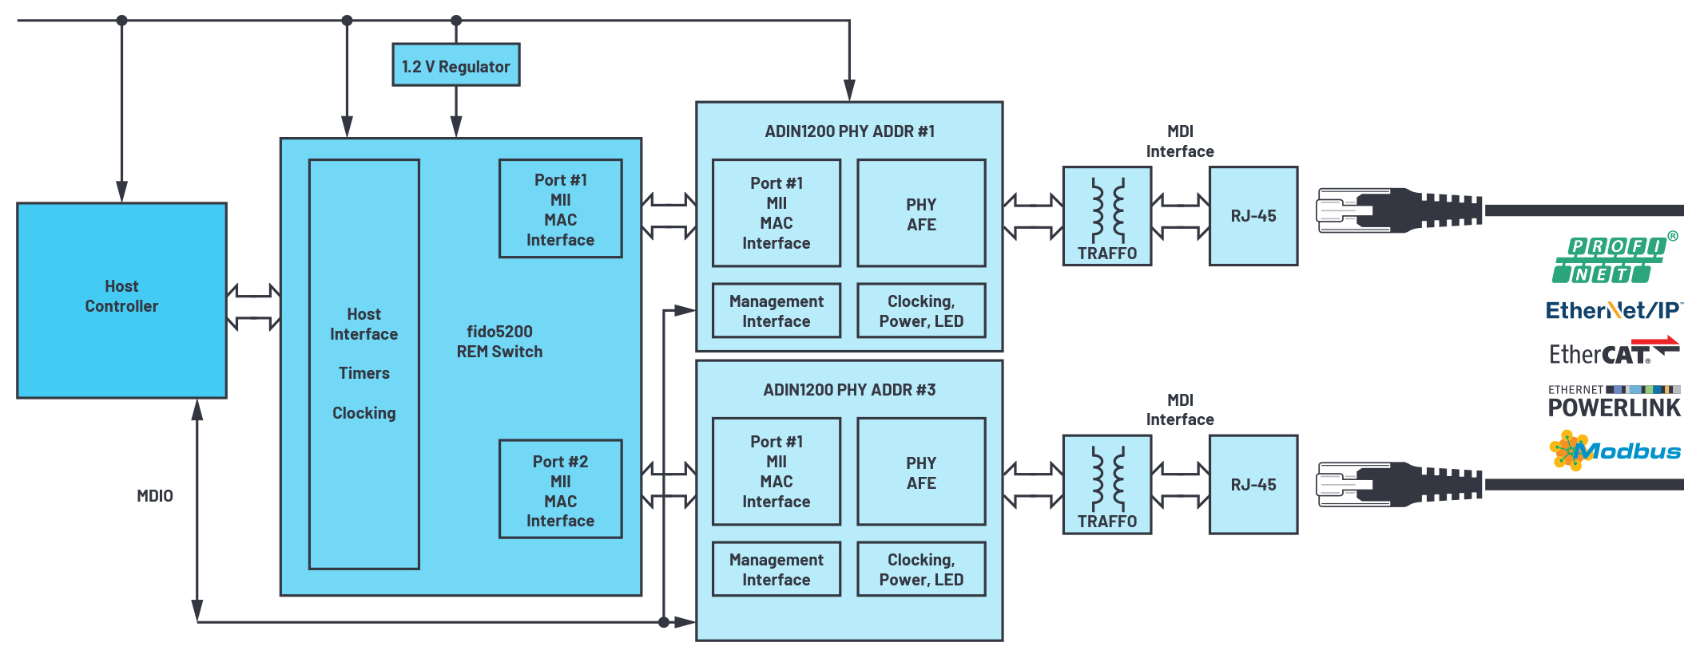 ADI推出时限通信的可靠以太网物理层解决方案